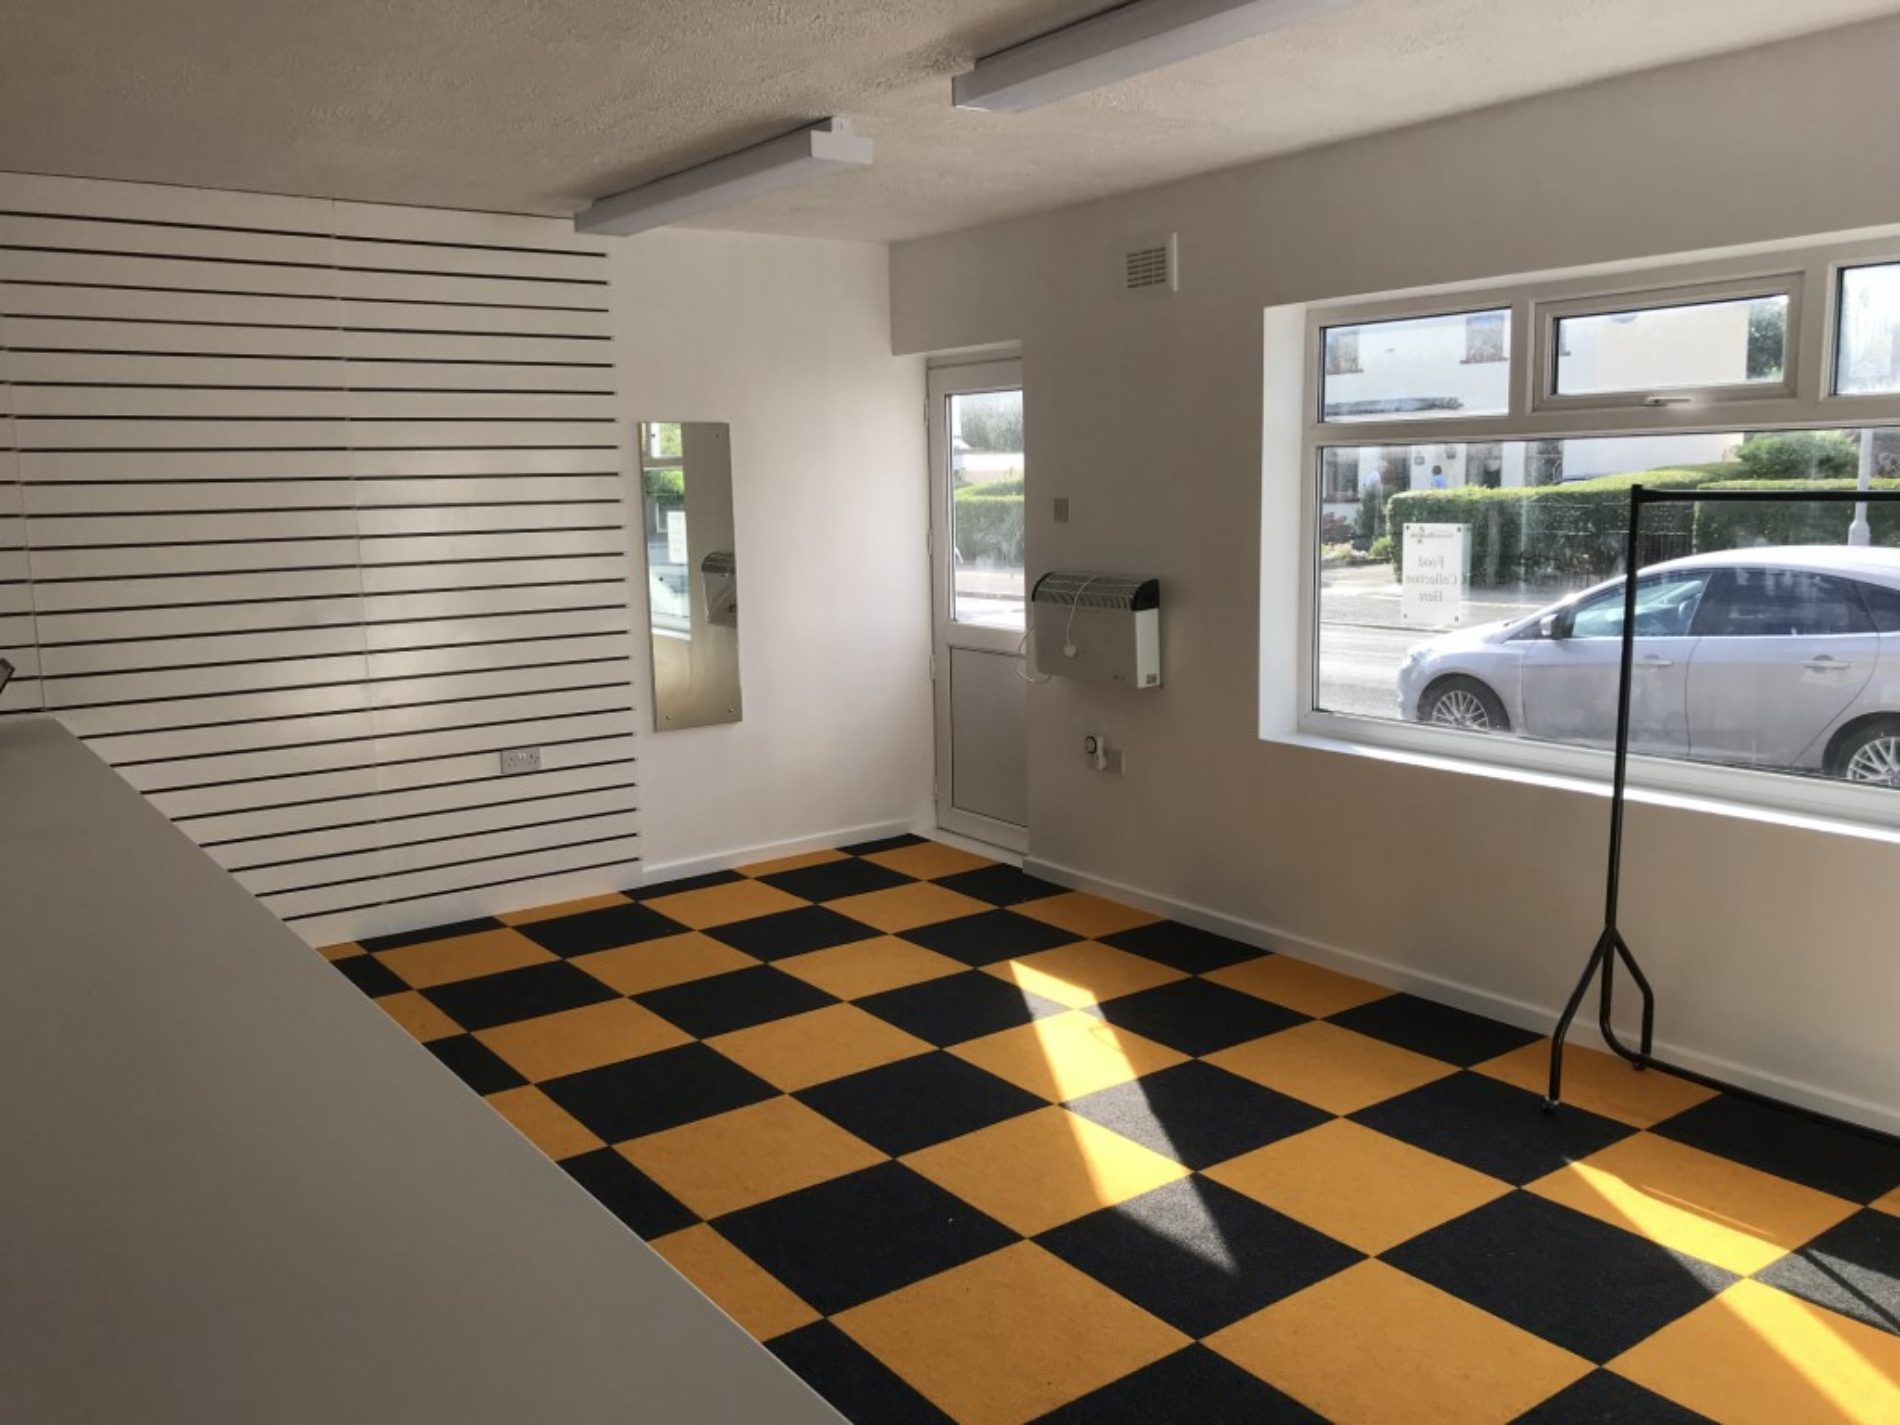 Club Shop Flooring Goes Down